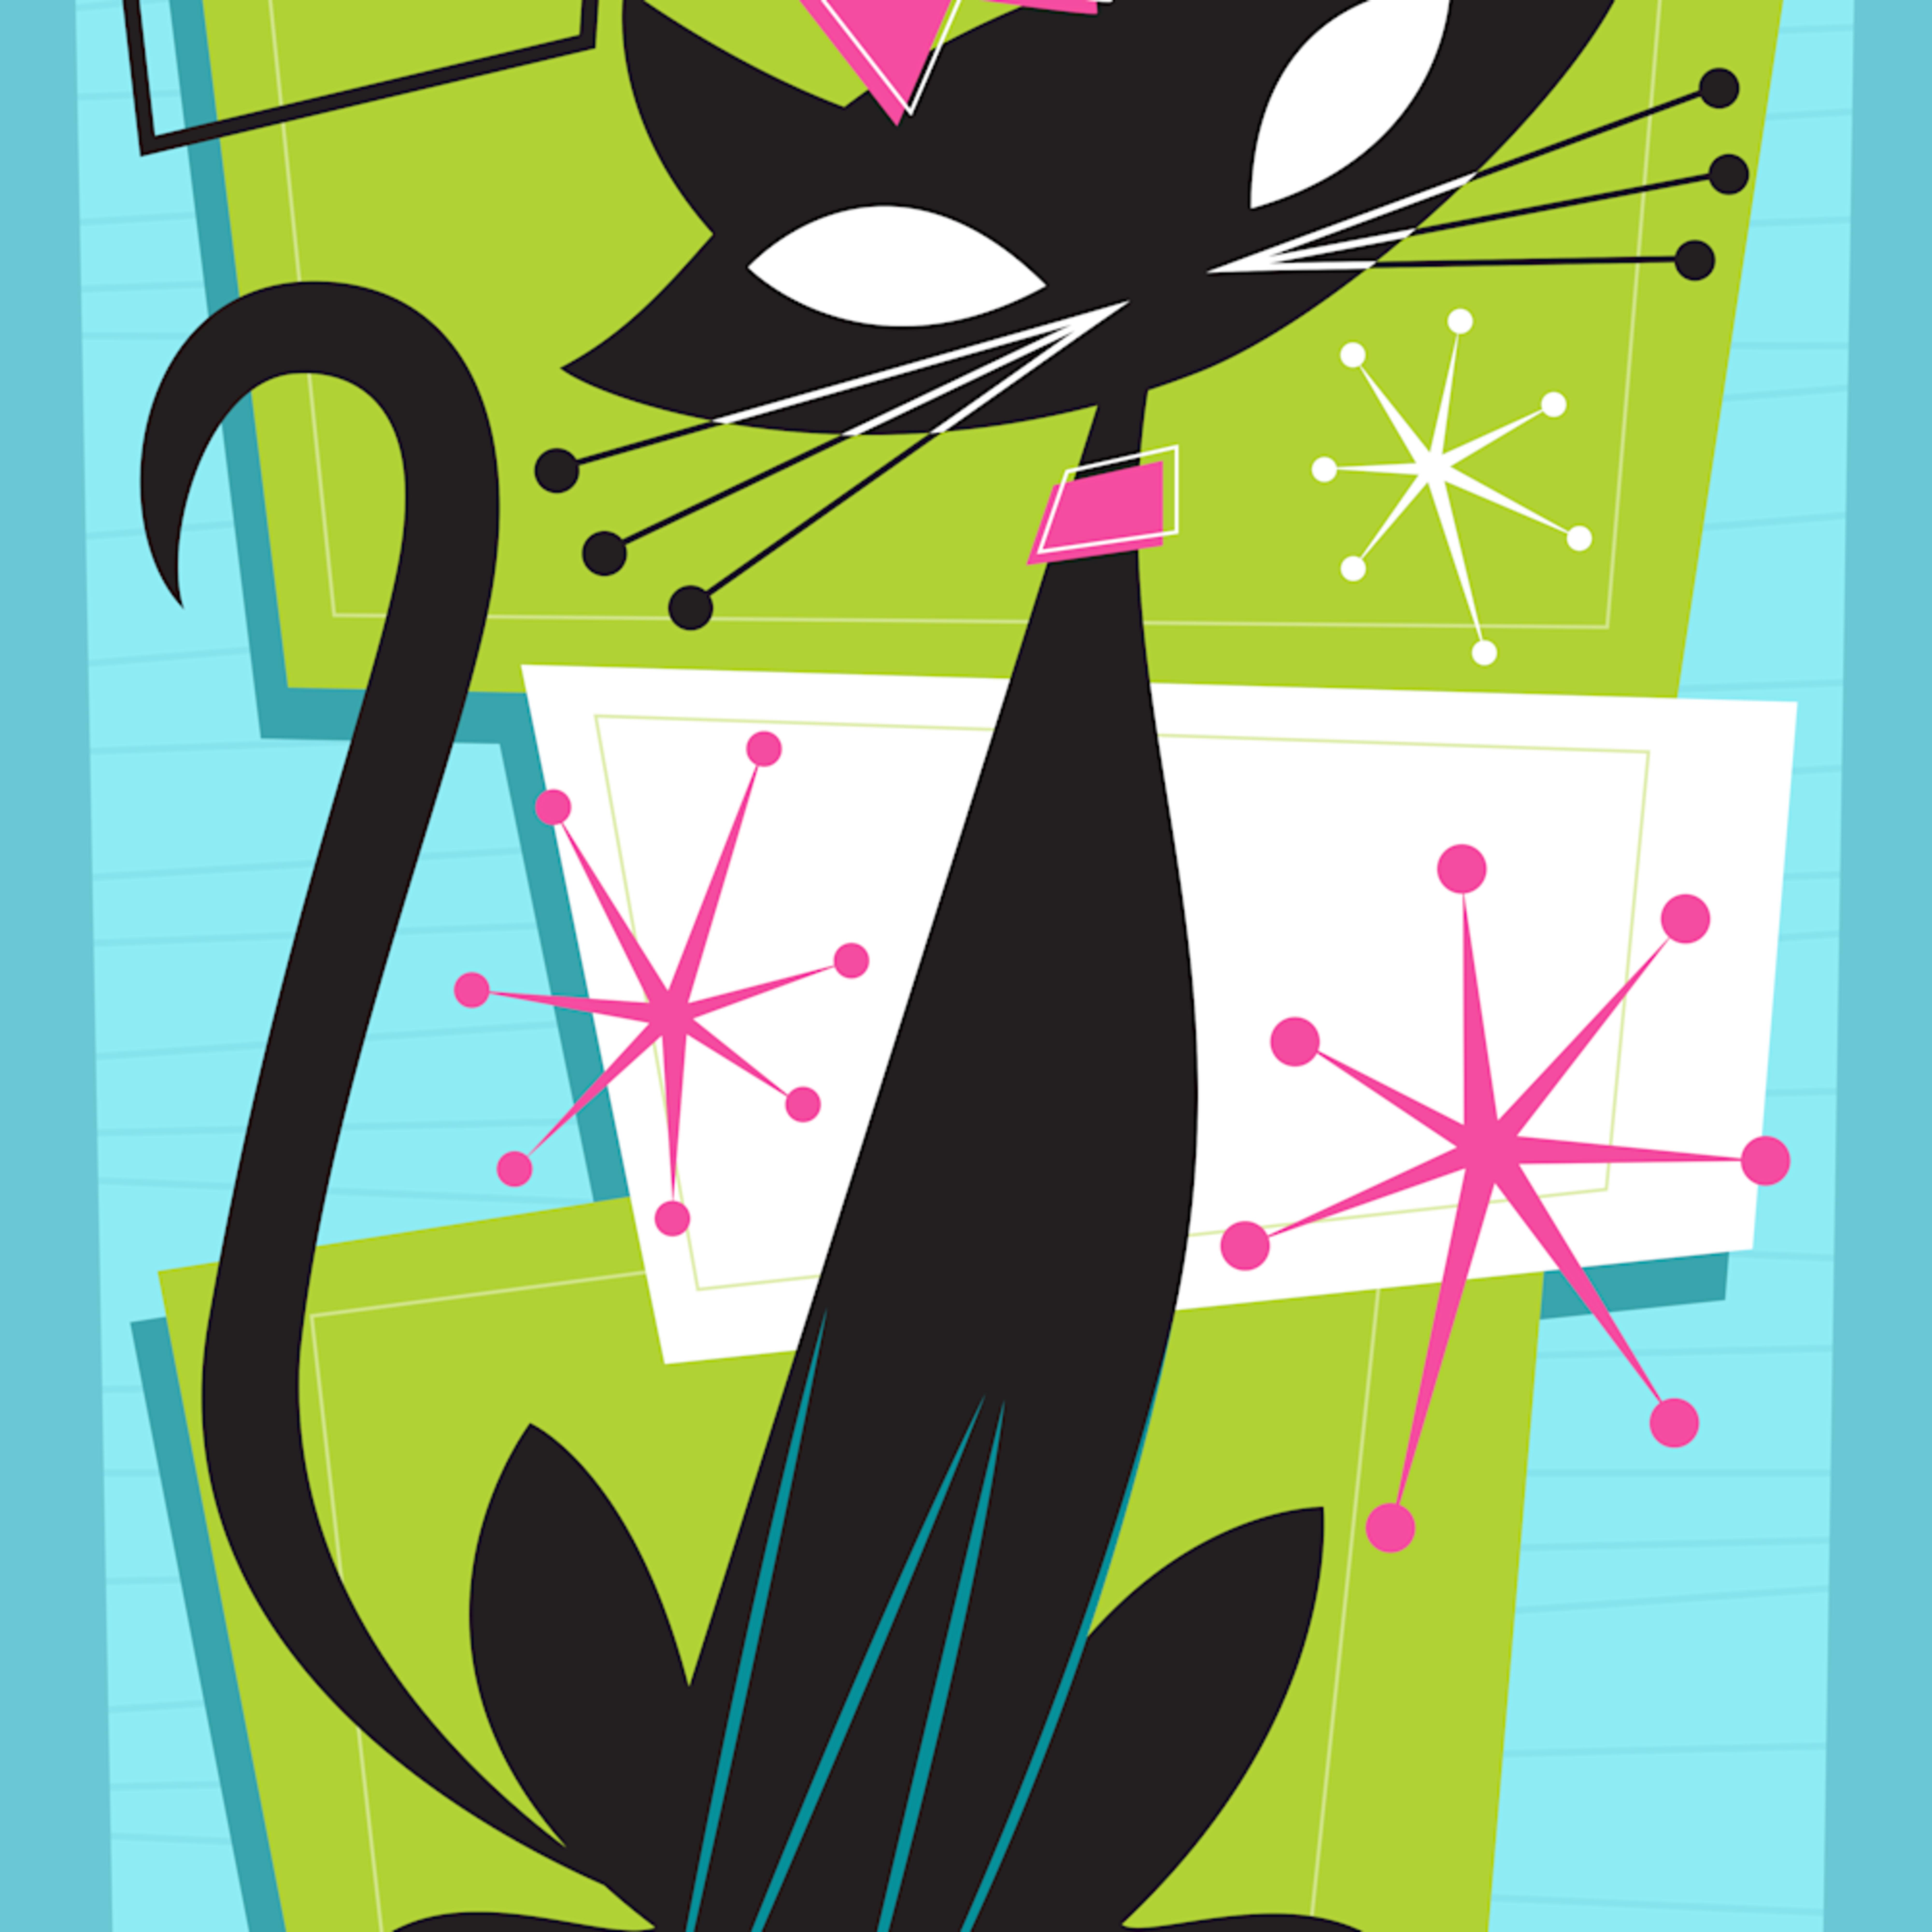 Atomic princess cat 1 ymkpce